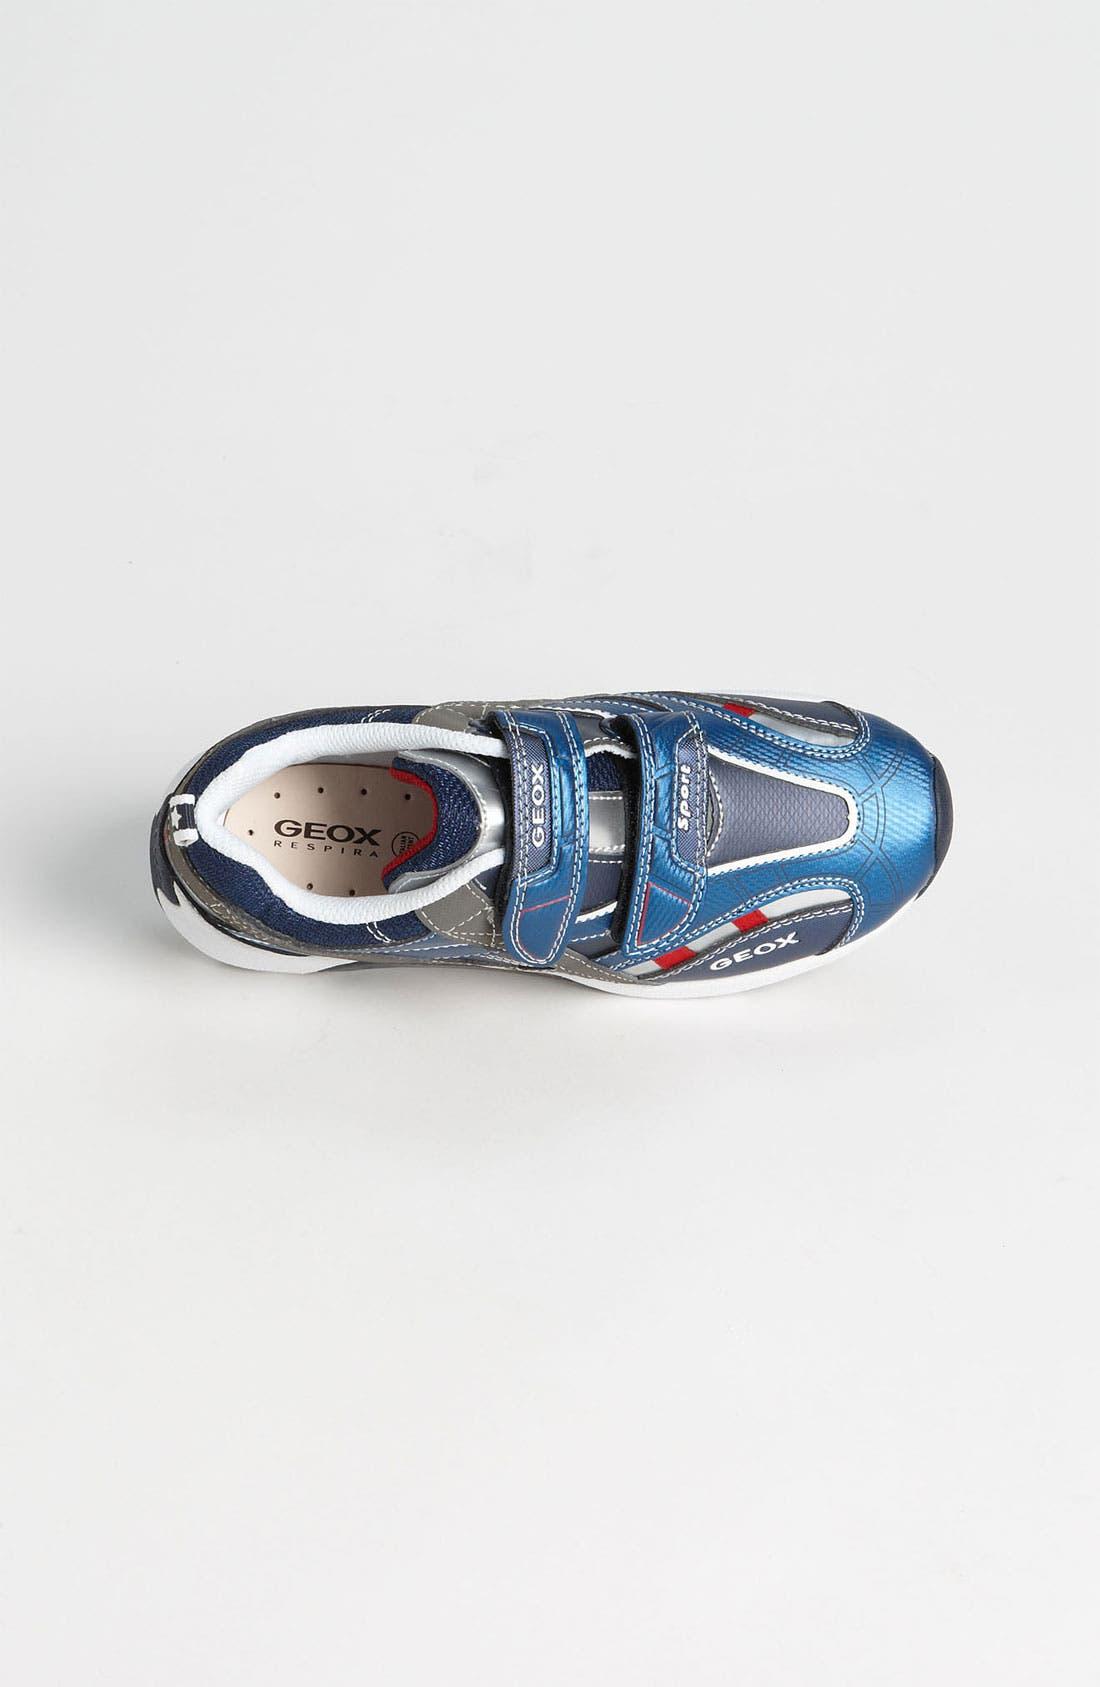 Alternate Image 3  - Geox 'Stark' Sneaker (Toddler, Little Kid & Big Kid)